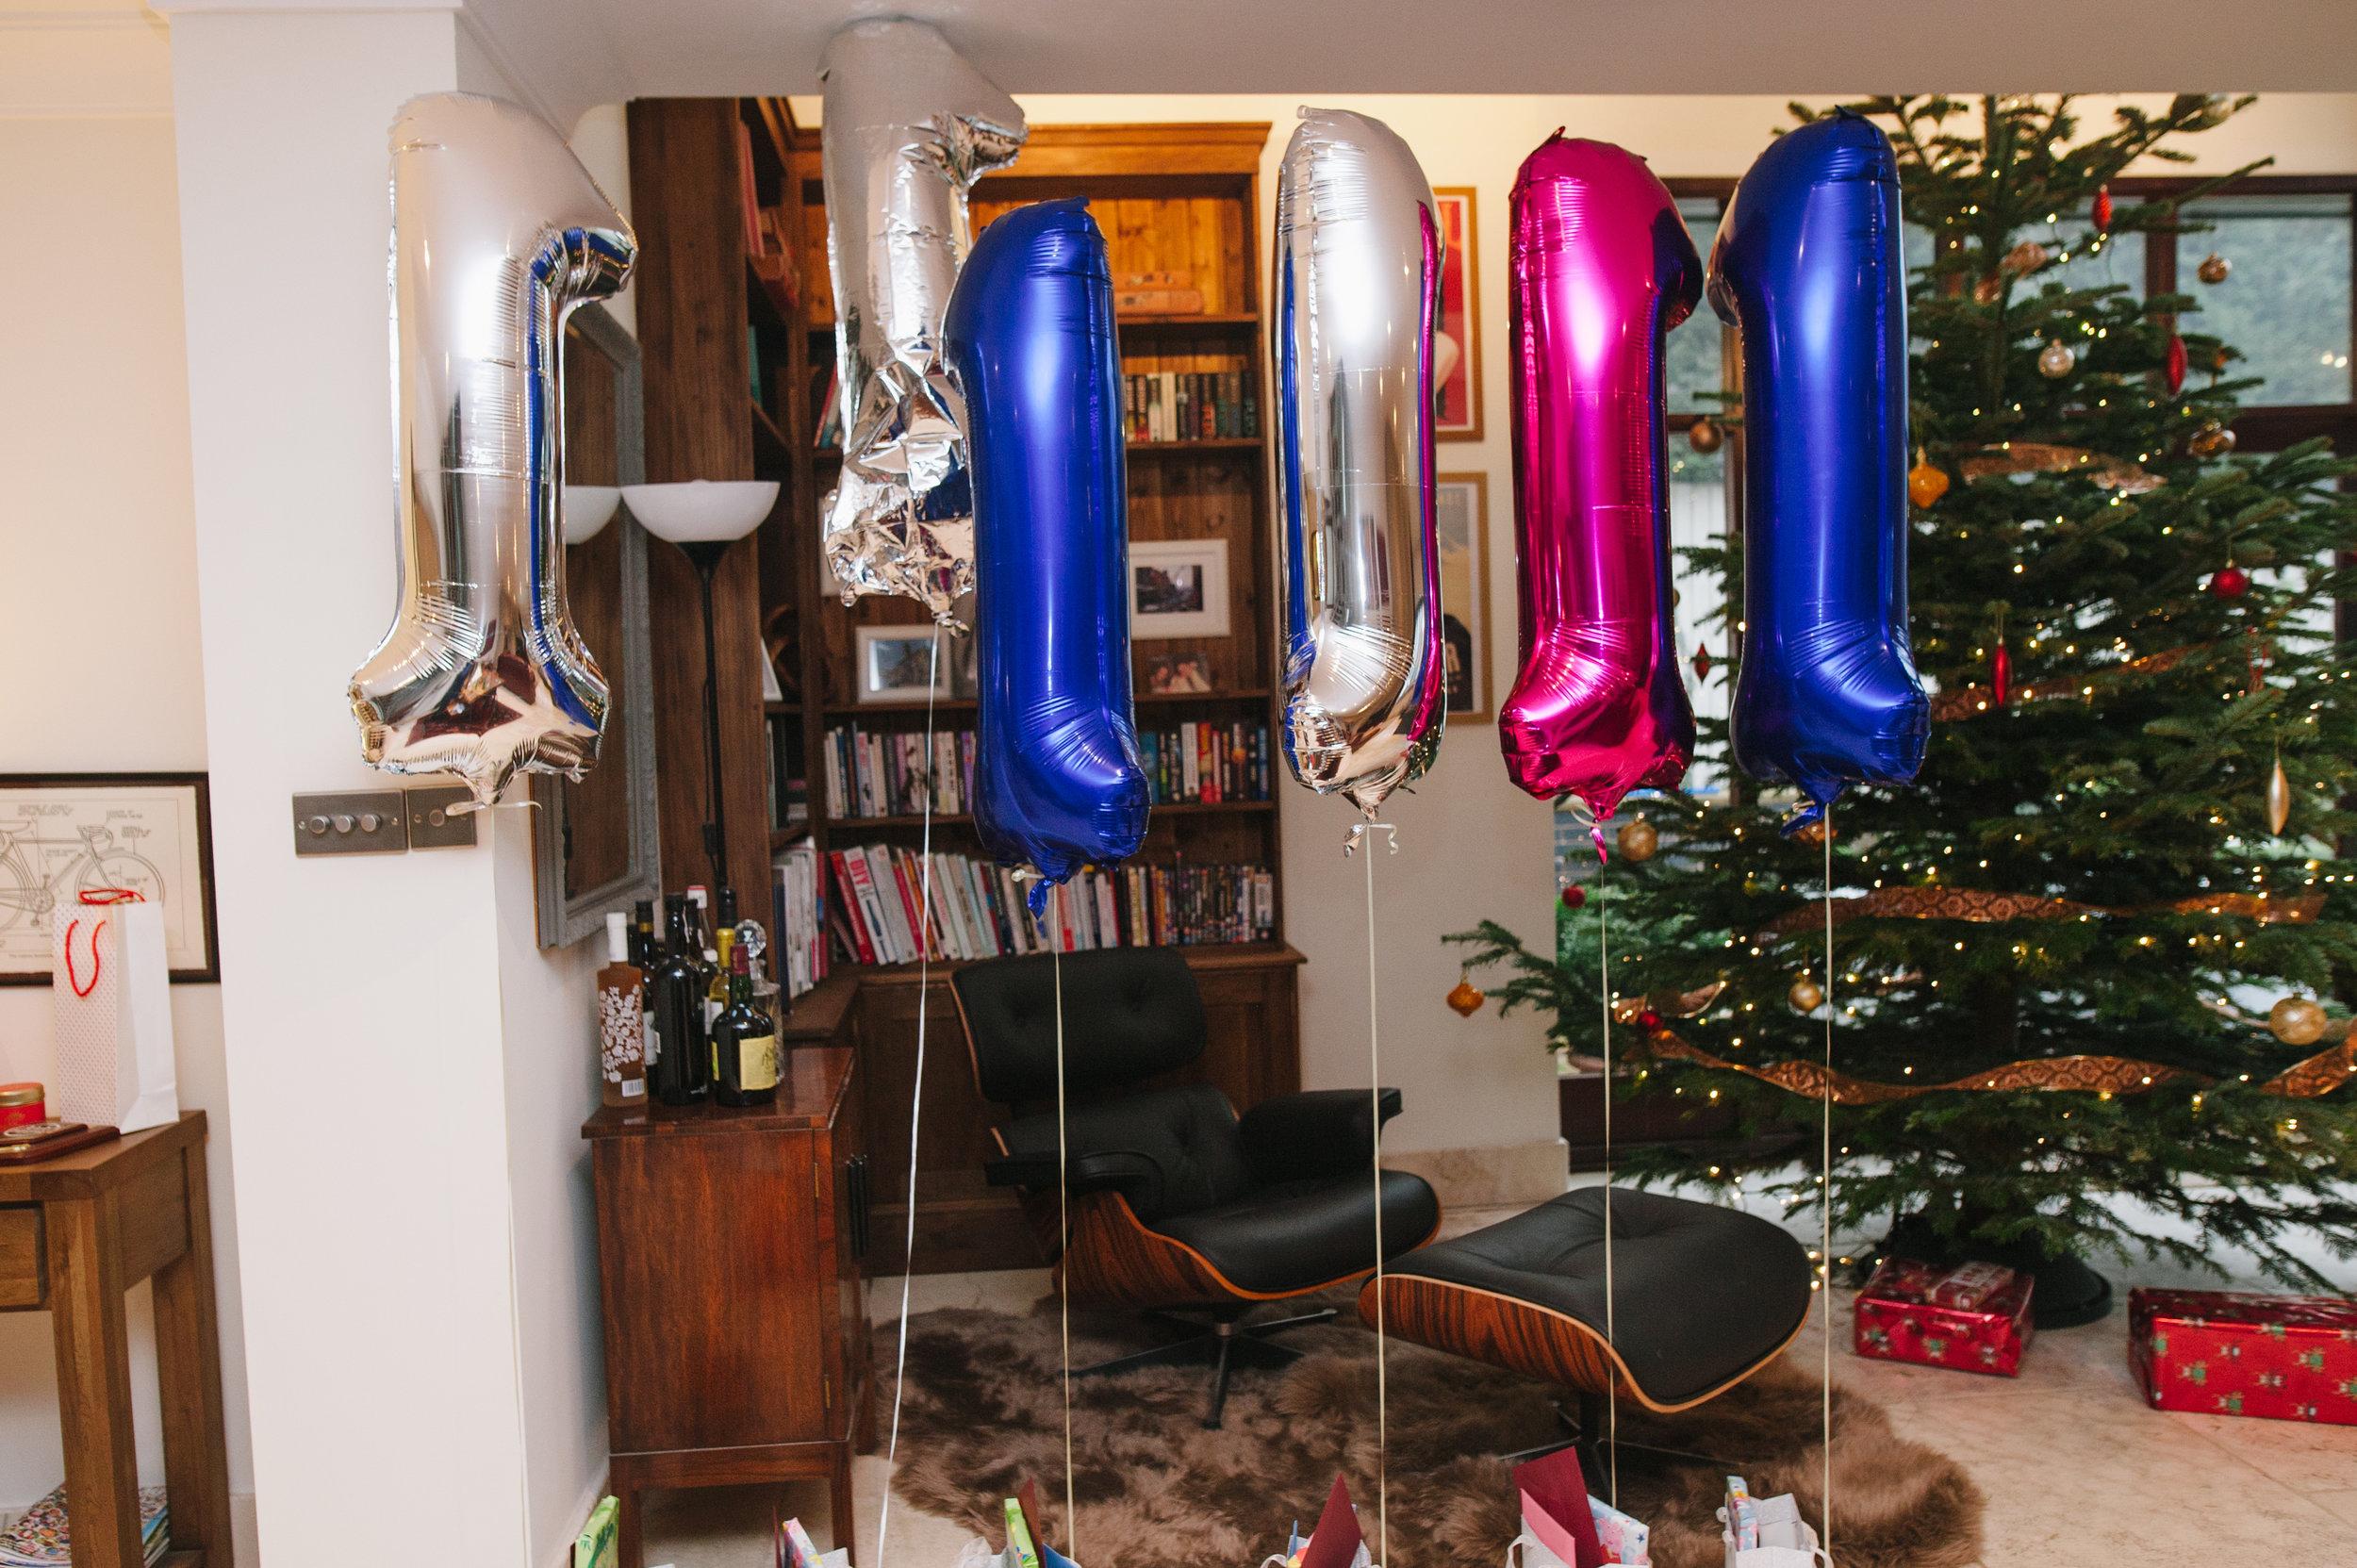 142-nct-1st-birthday-party_25335933308_o.jpg